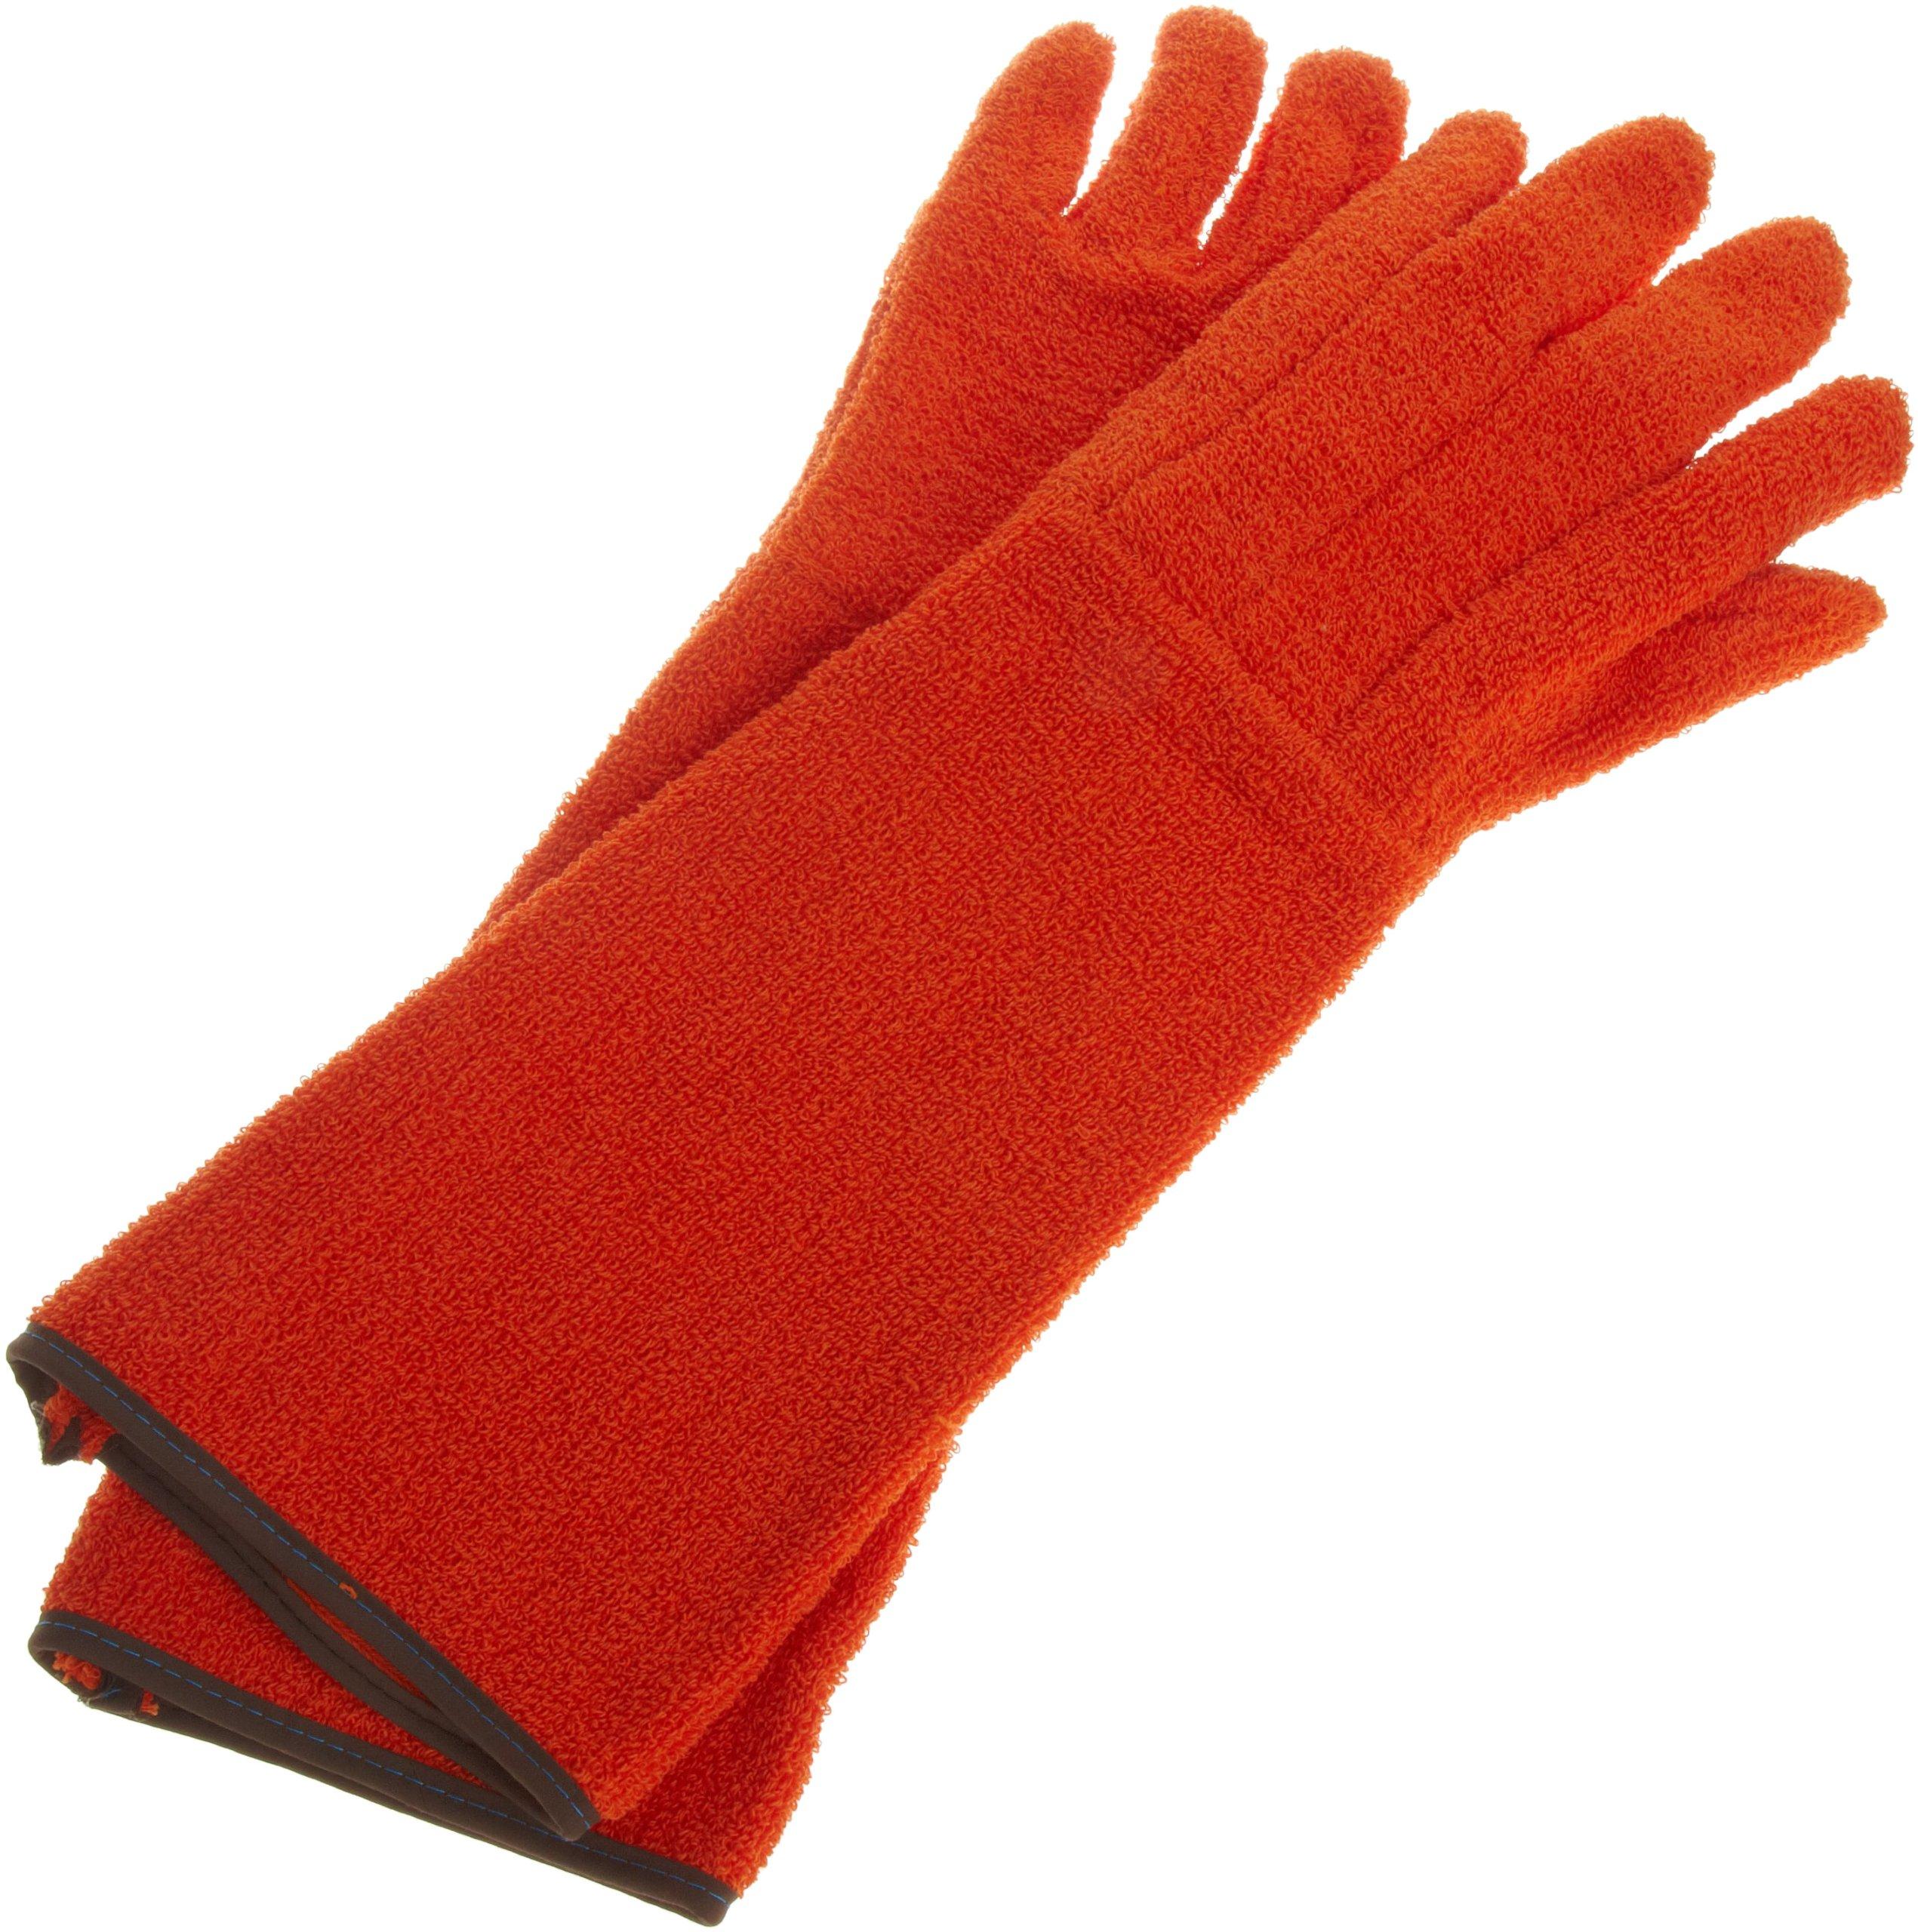 Bel-Art Clavies Heat Resistant Biohazard Autoclave/Oven Gloves; 11 in. Gauntlet (H13201-0001) by SP Scienceware